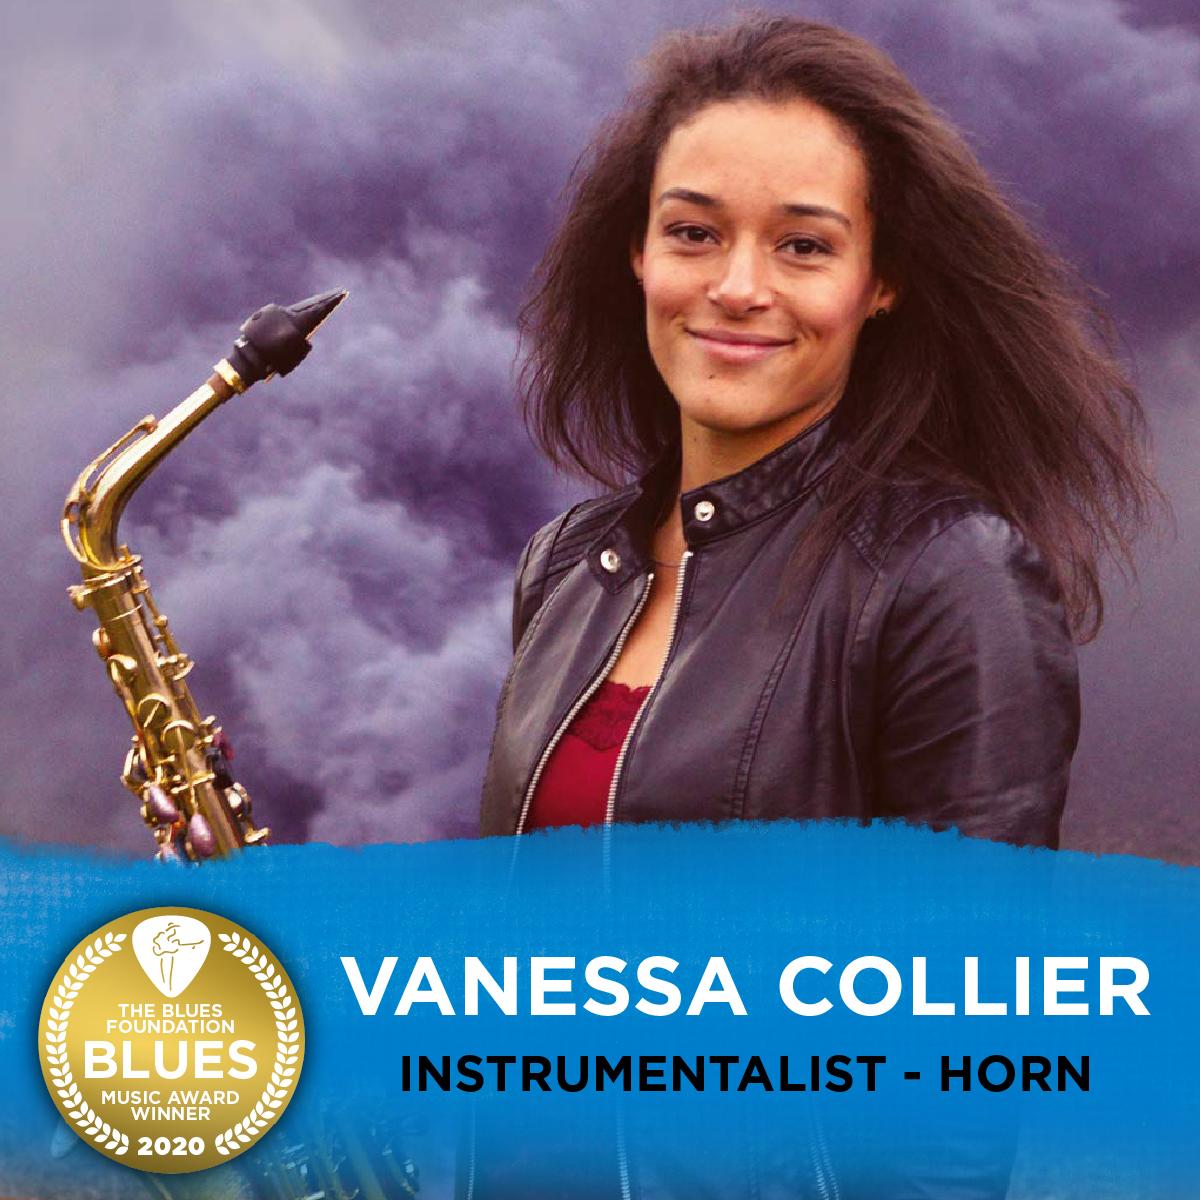 image of vanessa collier winner of bma